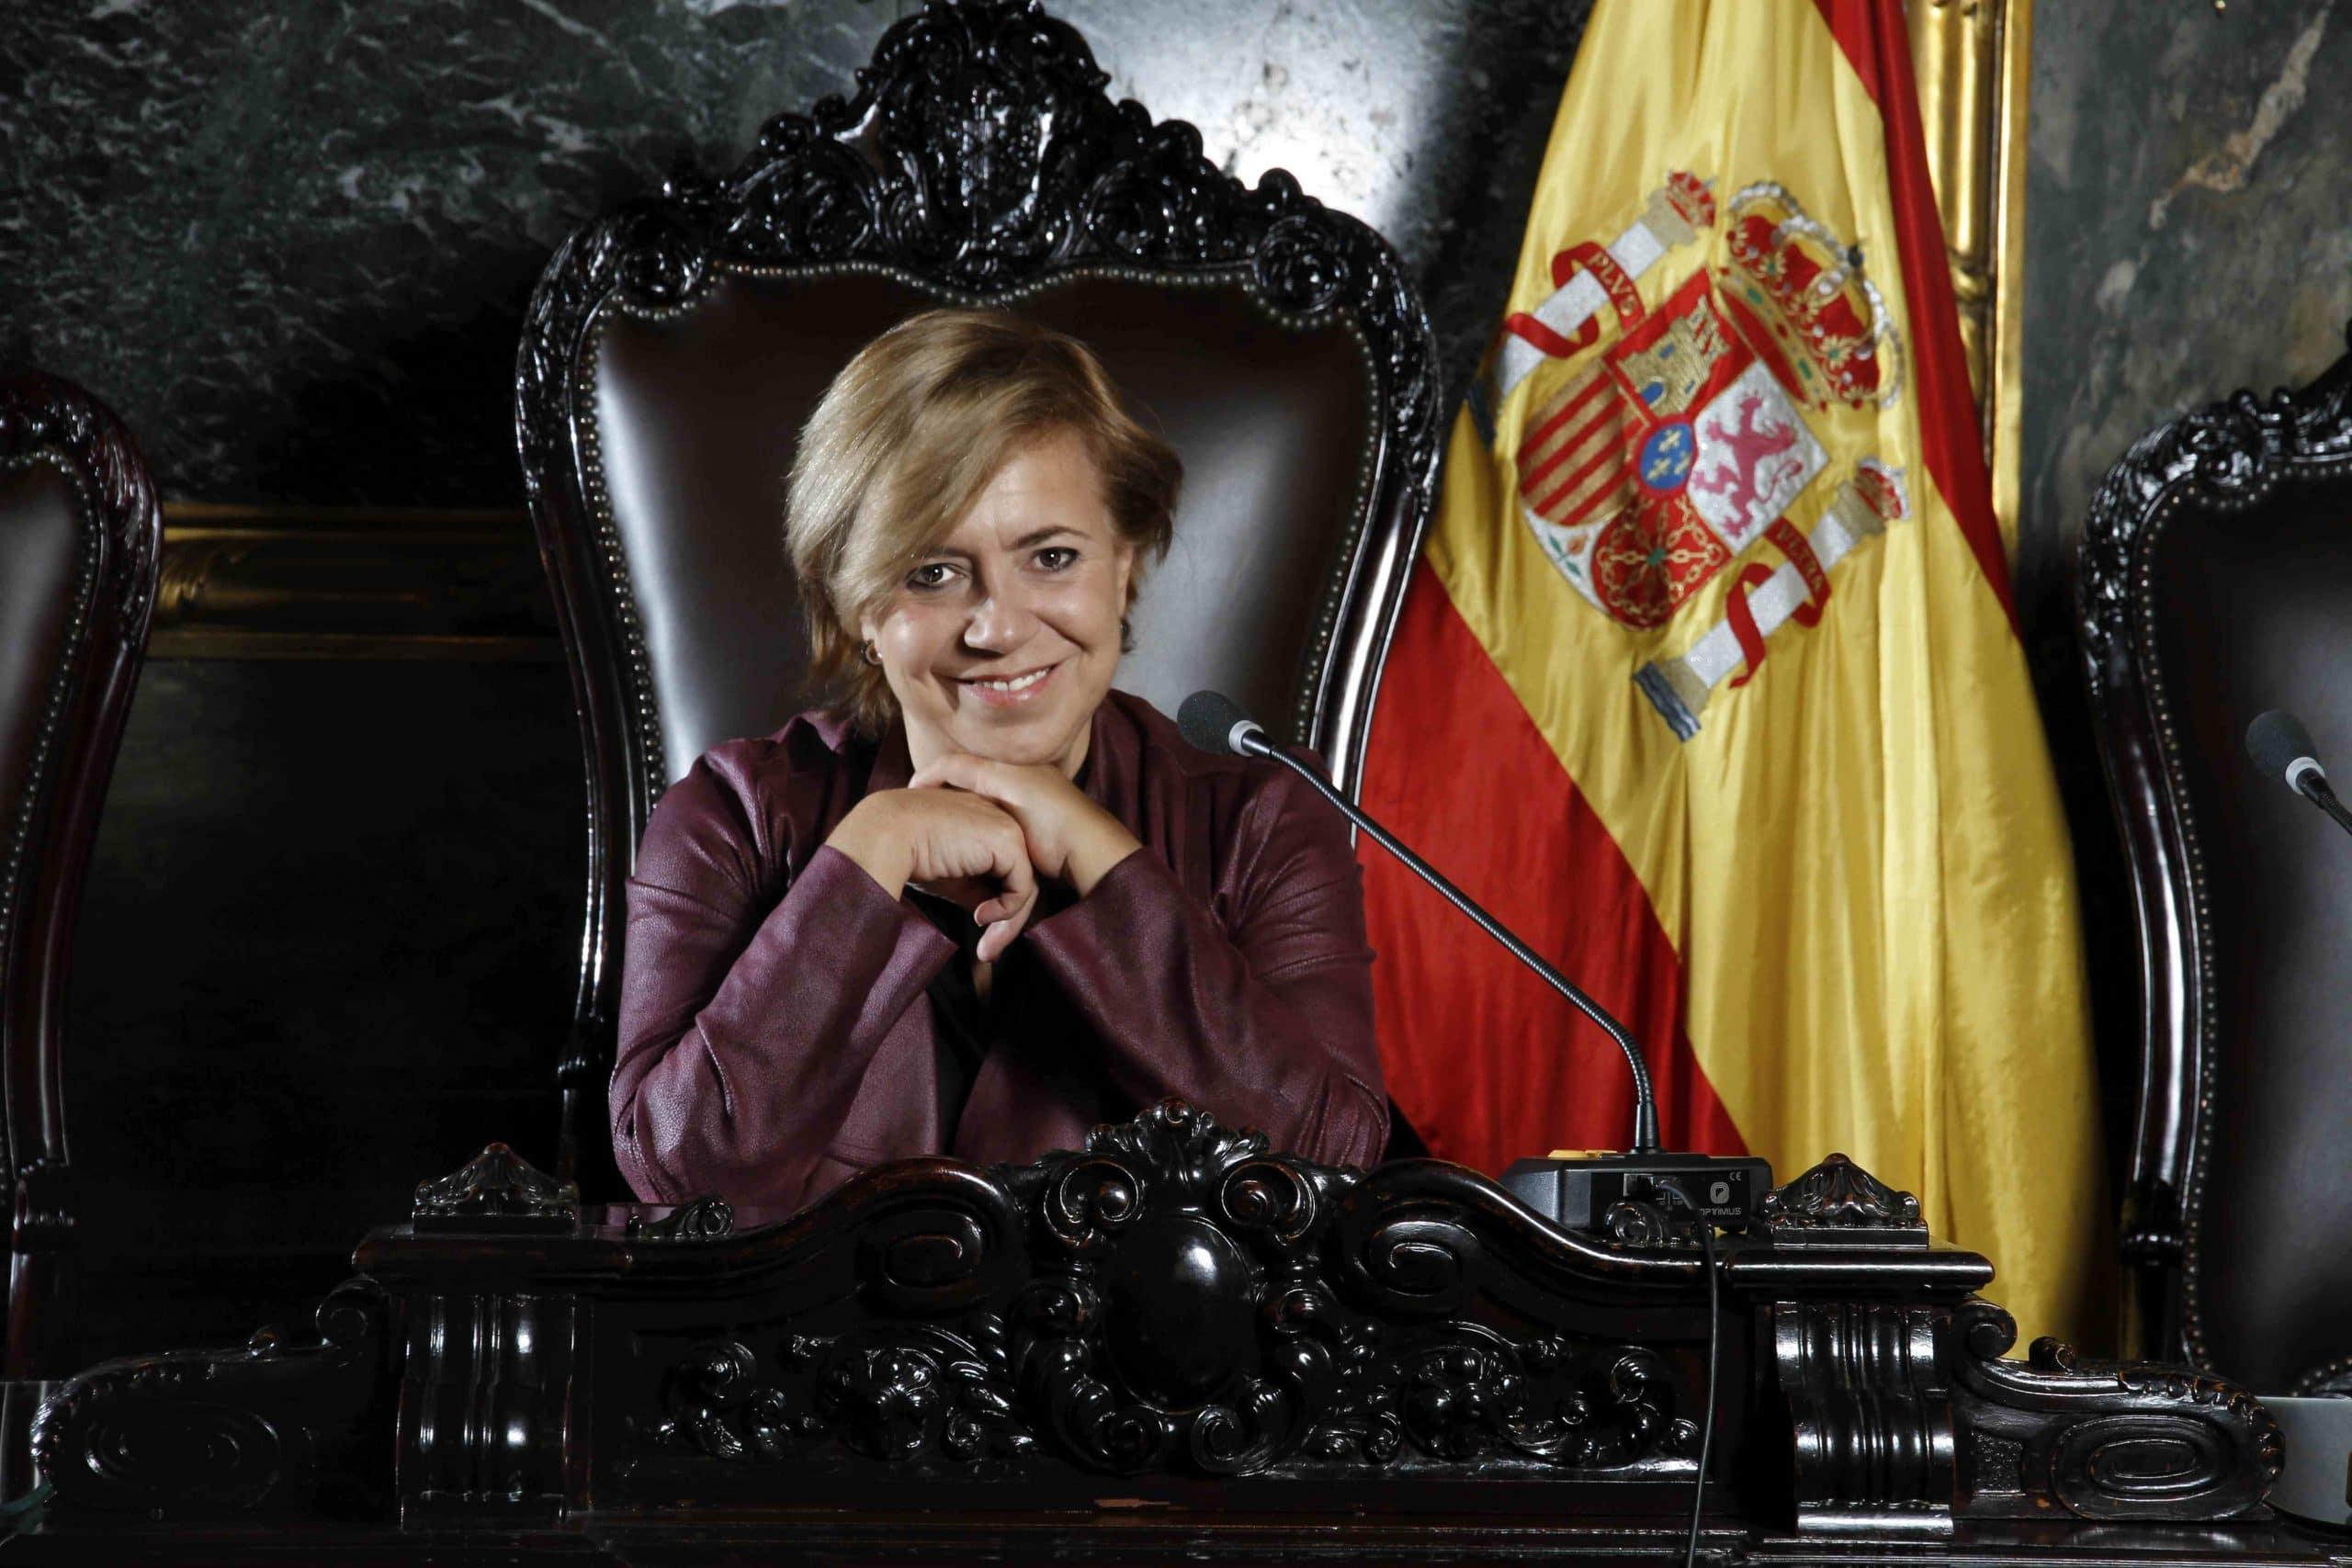 Ana María Ferrer García